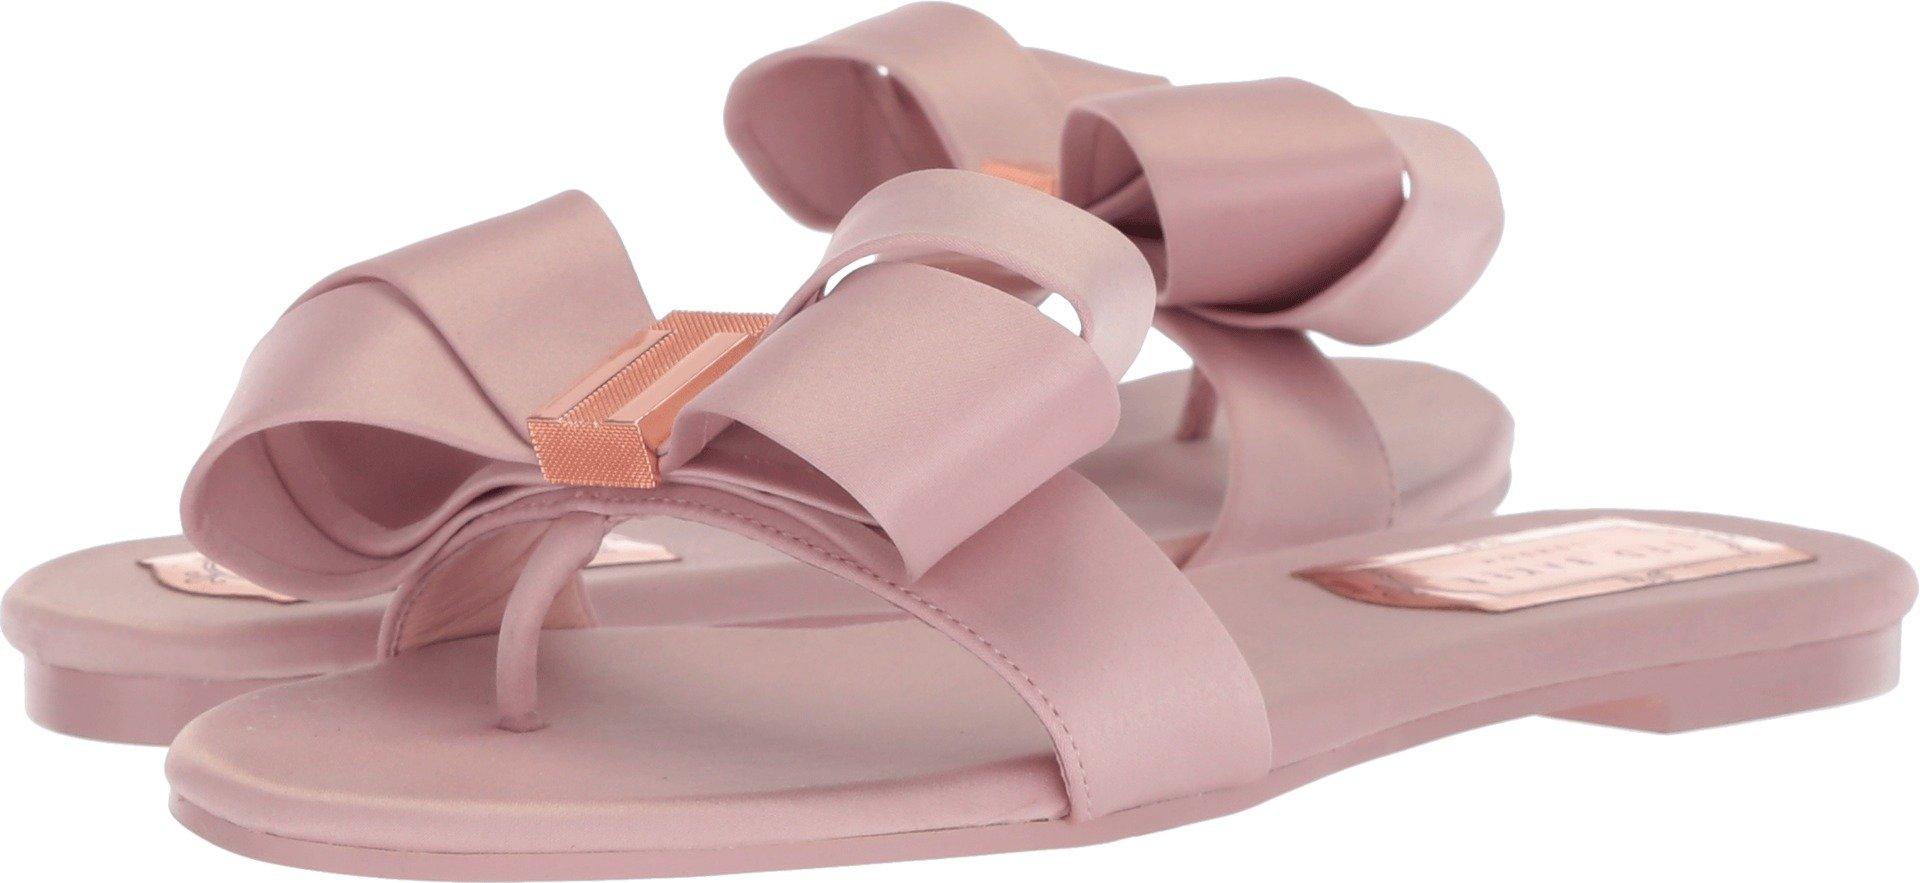 Ted Baker Women's Beauita Slide, Light Pink, 9.5 B(M) US